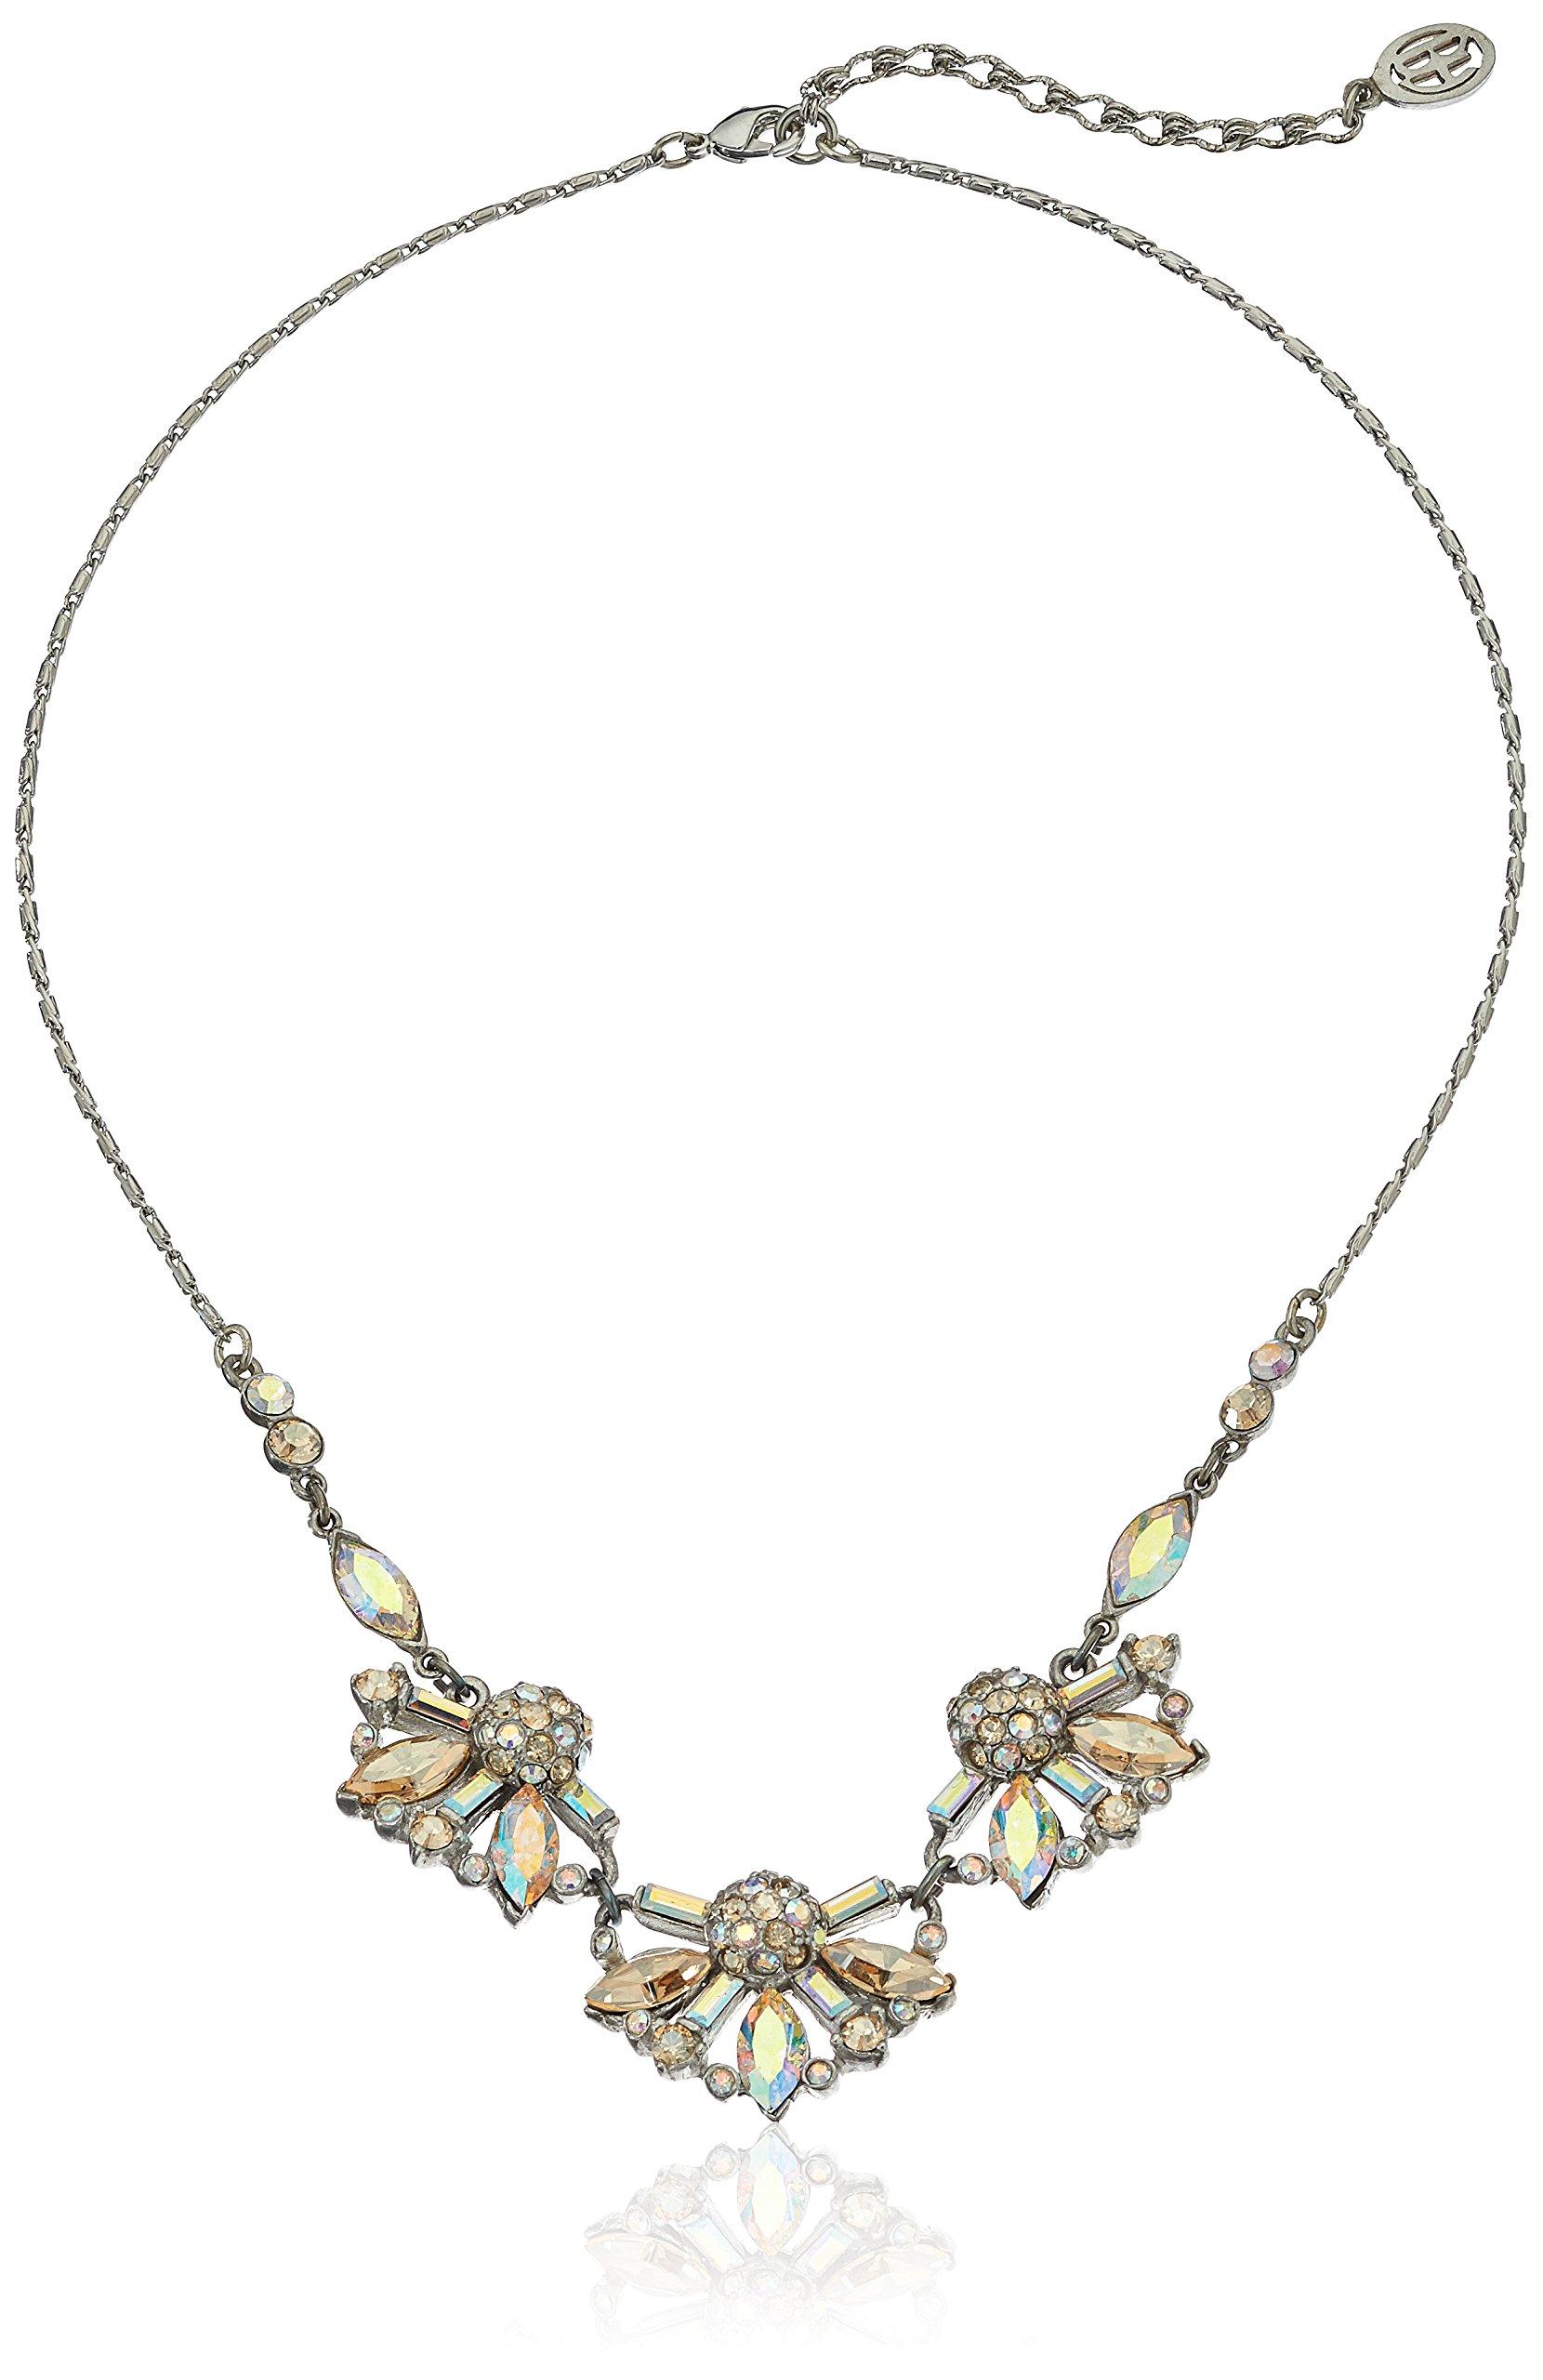 Ben-Amun Jewelry Swarovski Crystal Amore Tuscan Necklace for Bridal Wedding Anniversary by Ben-Amun Jewelry